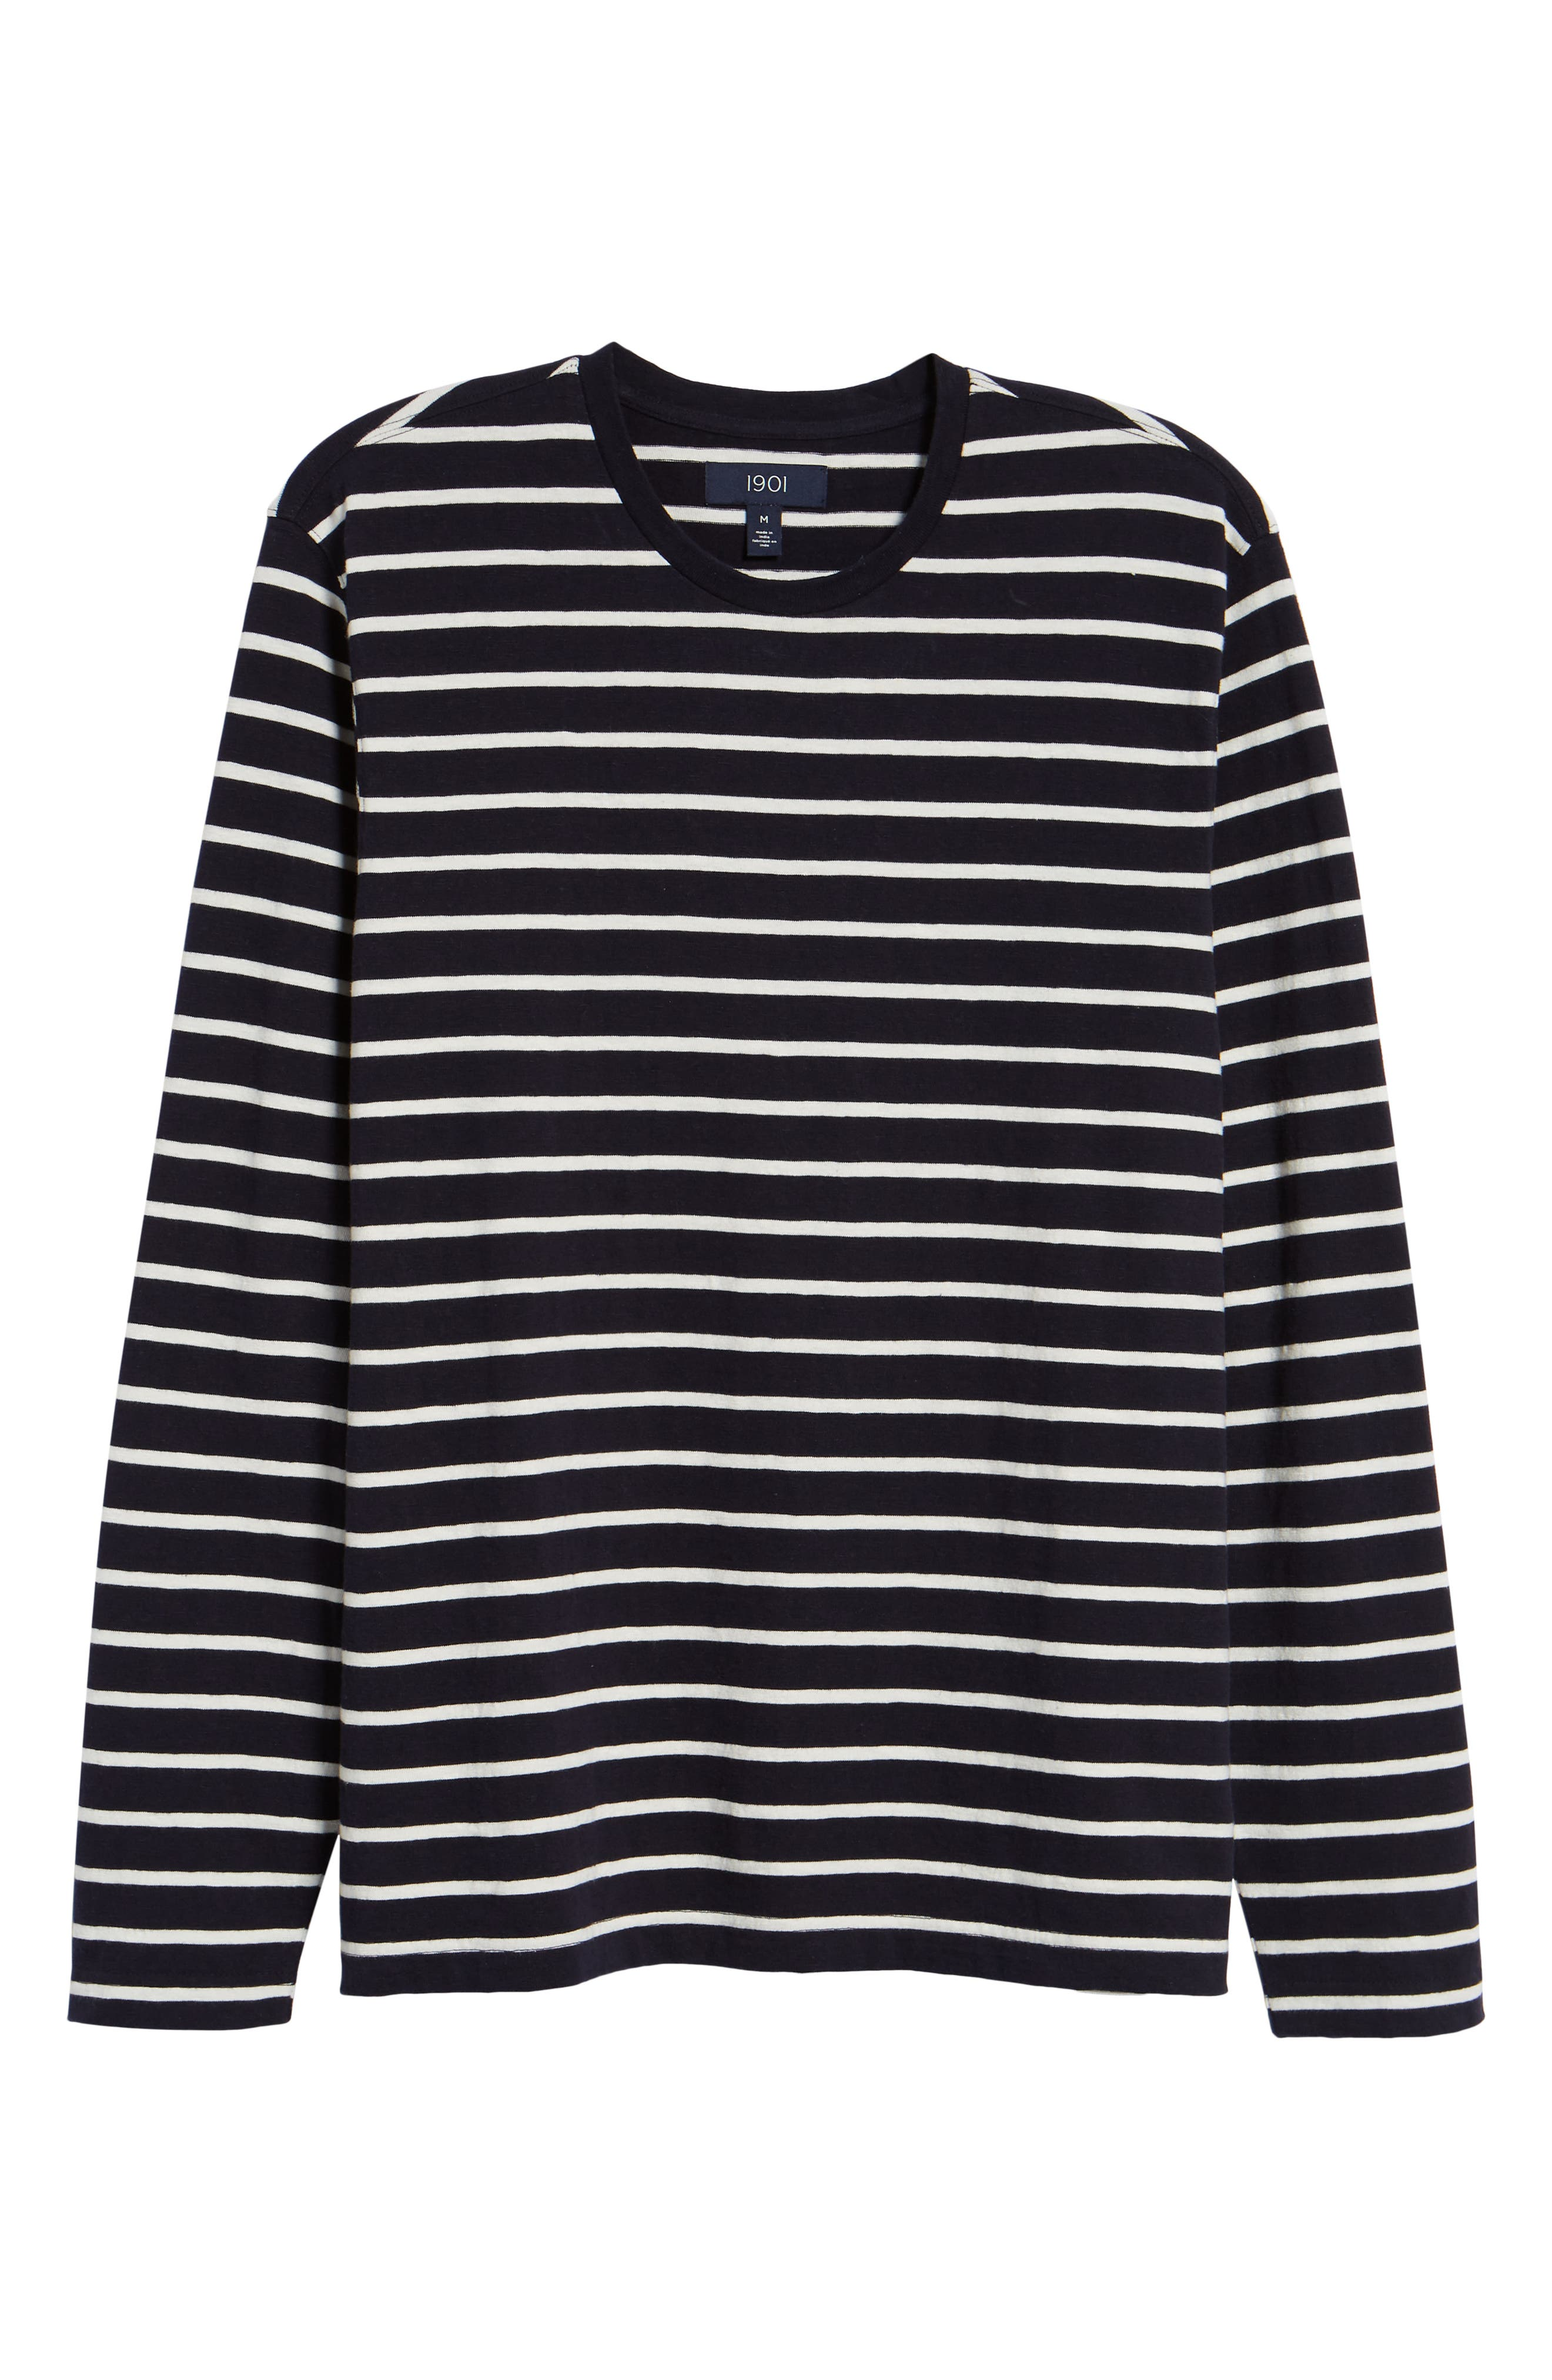 Stripe Long Sleeve T-Shirt,                             Alternate thumbnail 6, color,                             NAVY NIGHT ECRU STRIPE